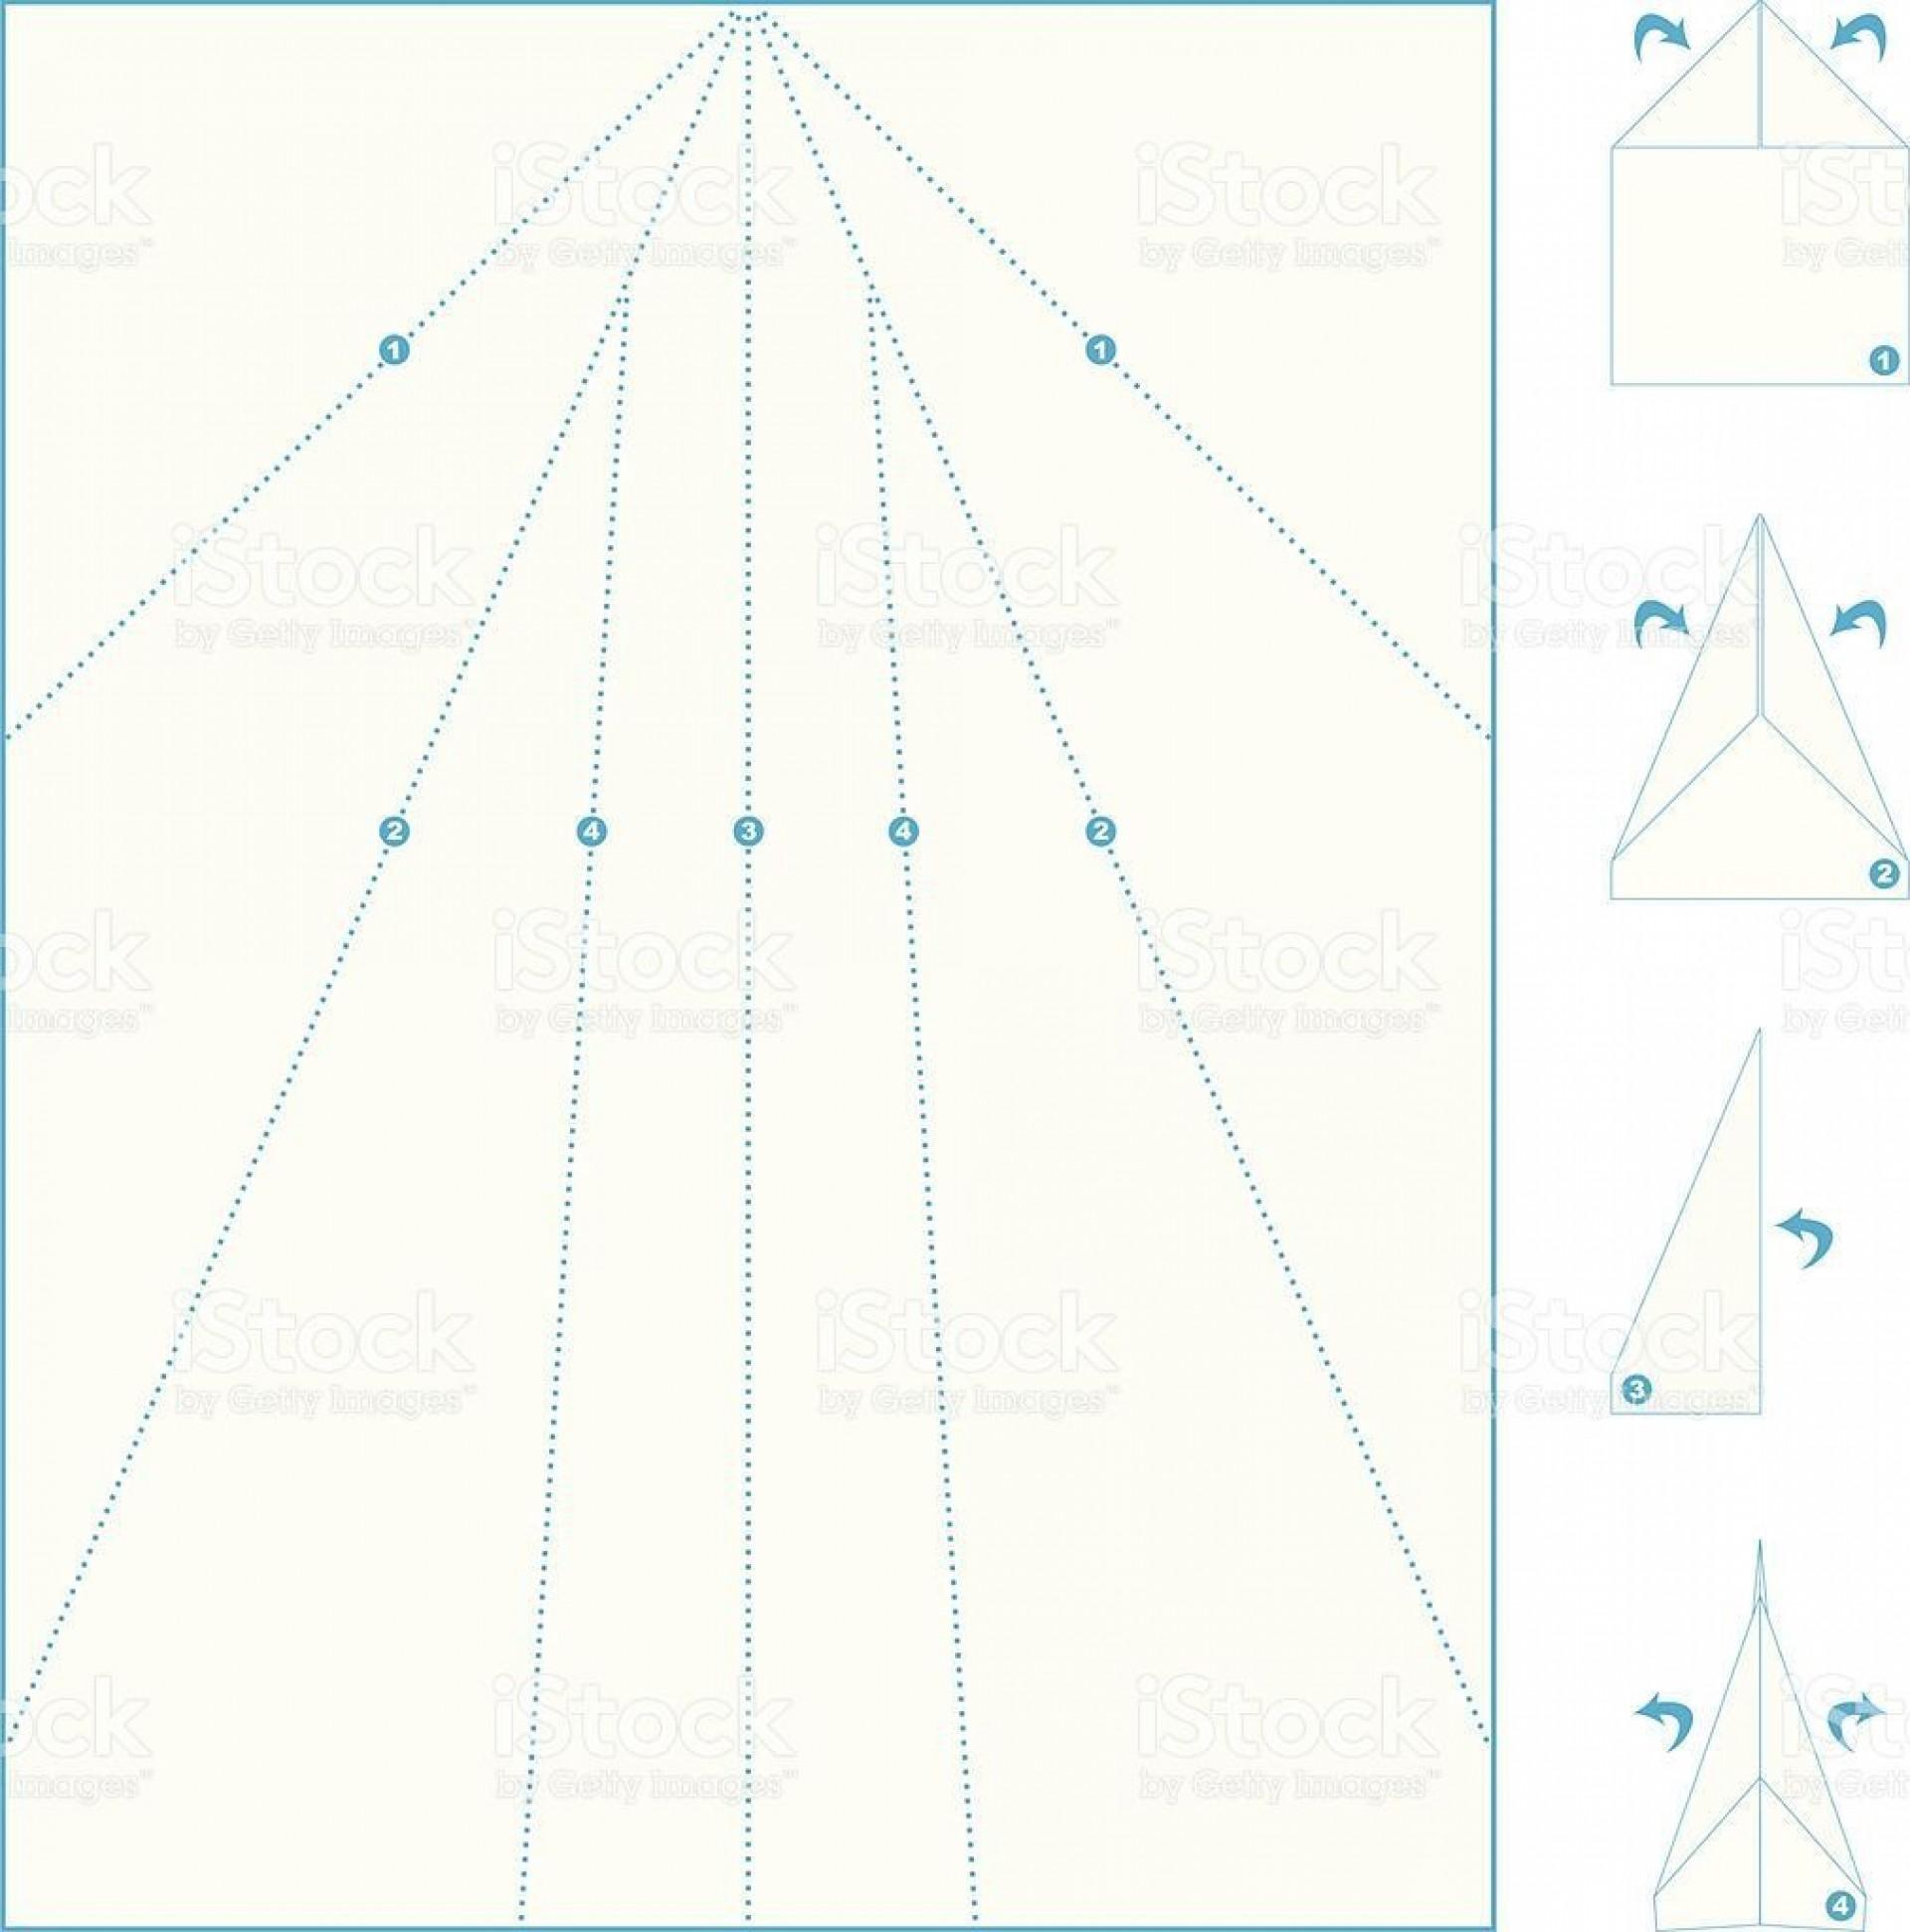 005 Wondrou Printable Paper Airplane Pattern Highest Clarity  Free Plane Design Designs-printable Template1920